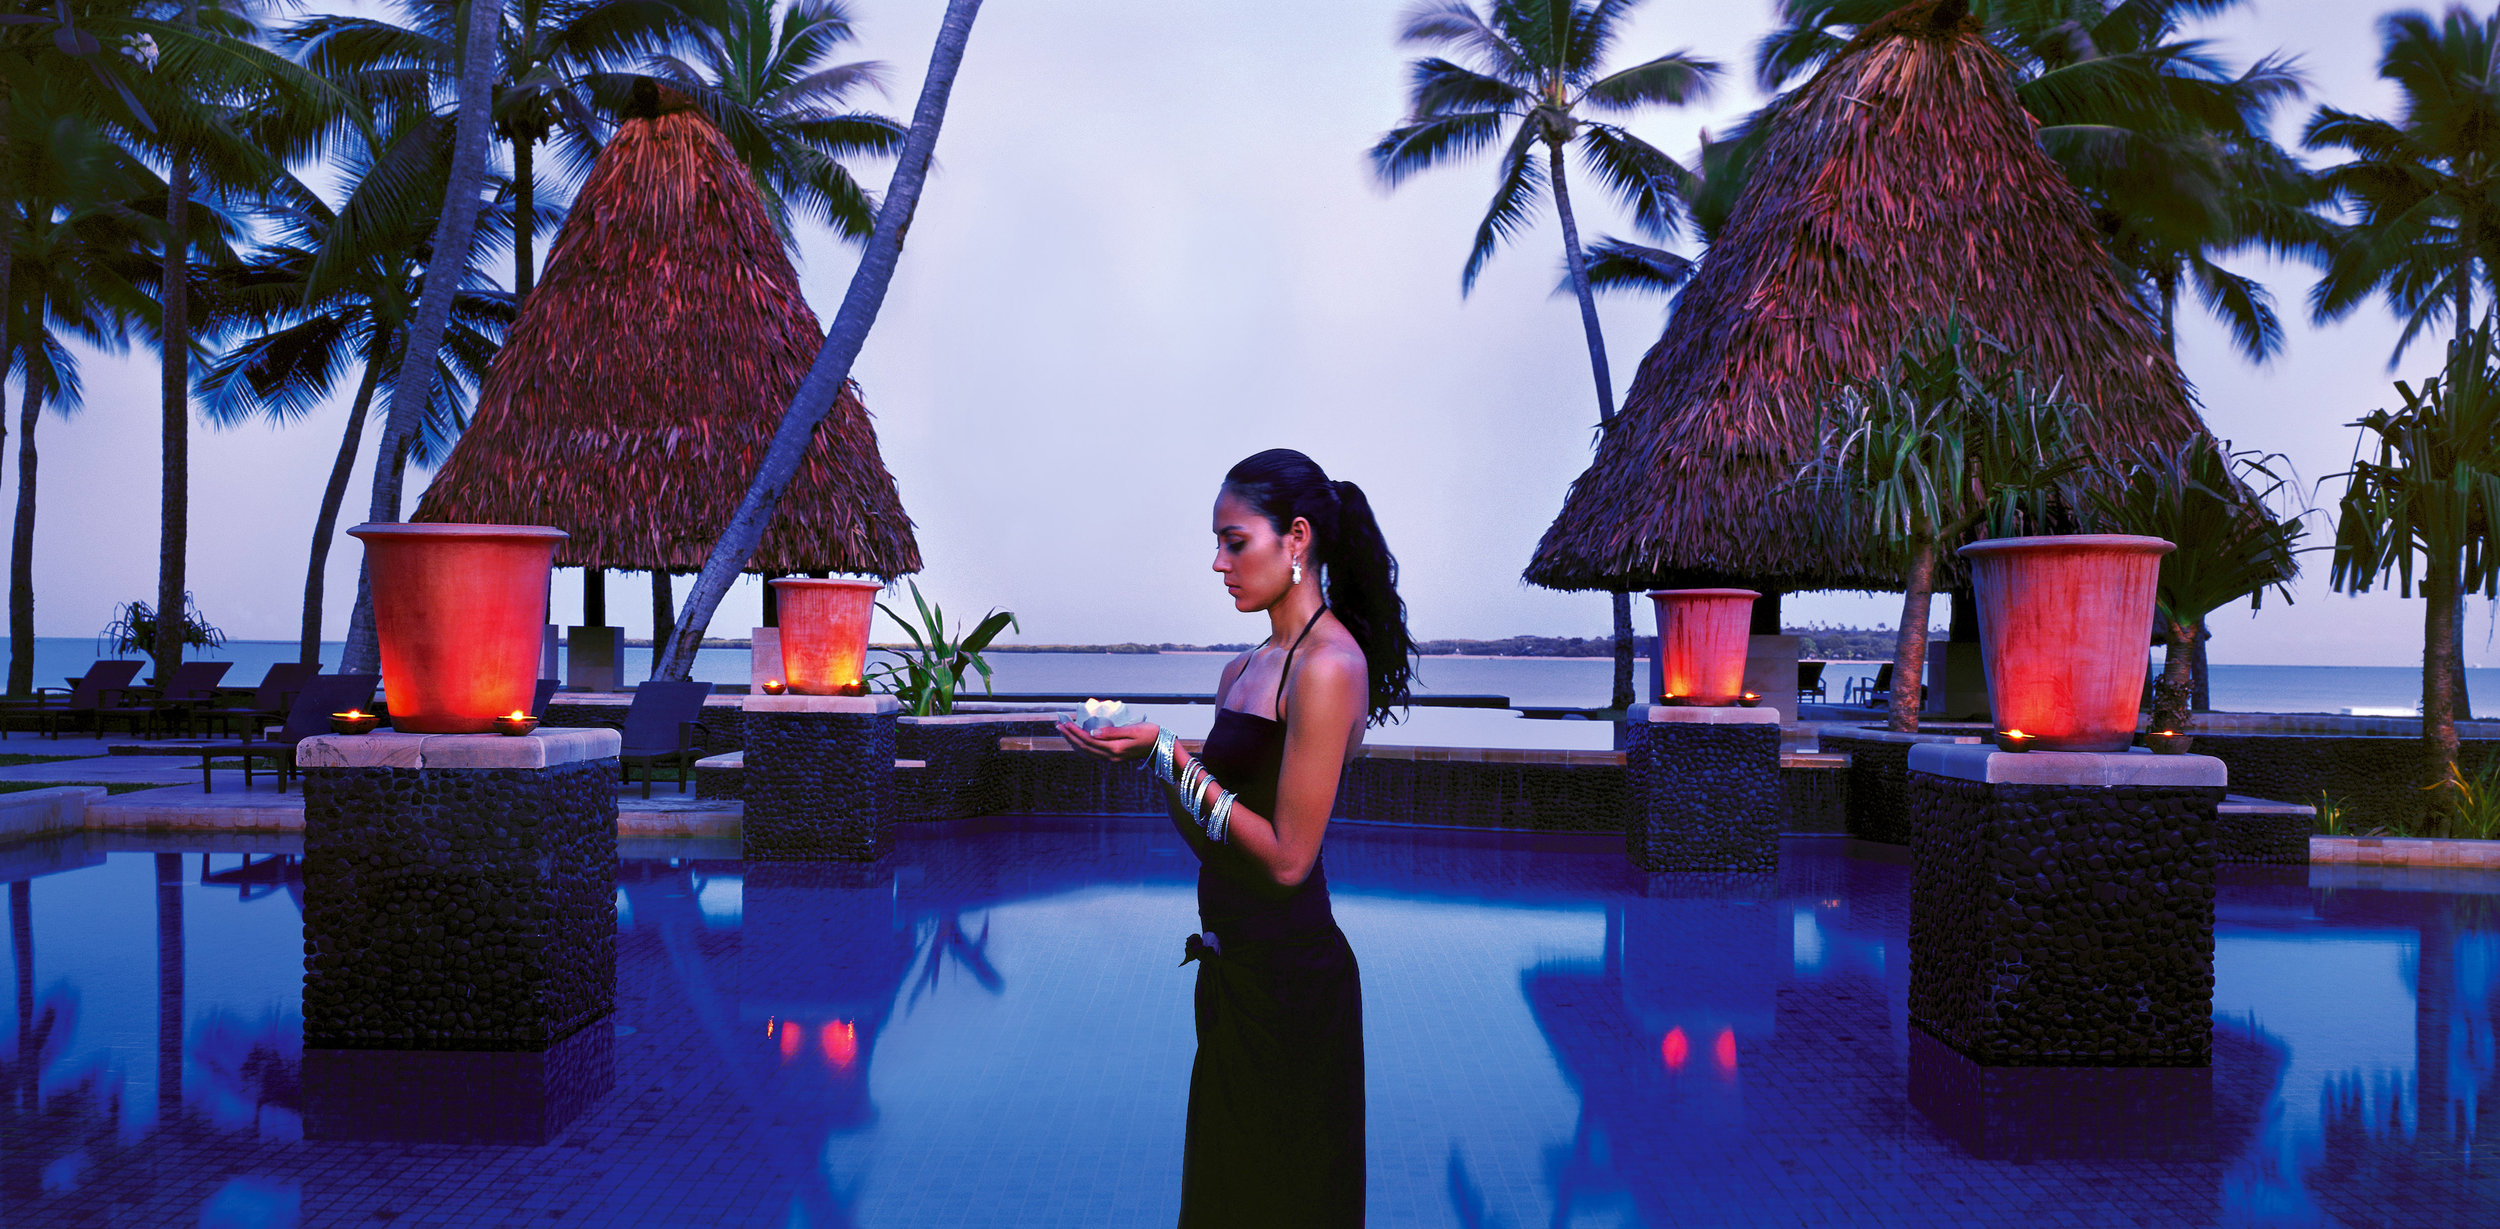 Westin-Denarau-Island-Resort-and-Spa-Fiji4956x2436.jpg